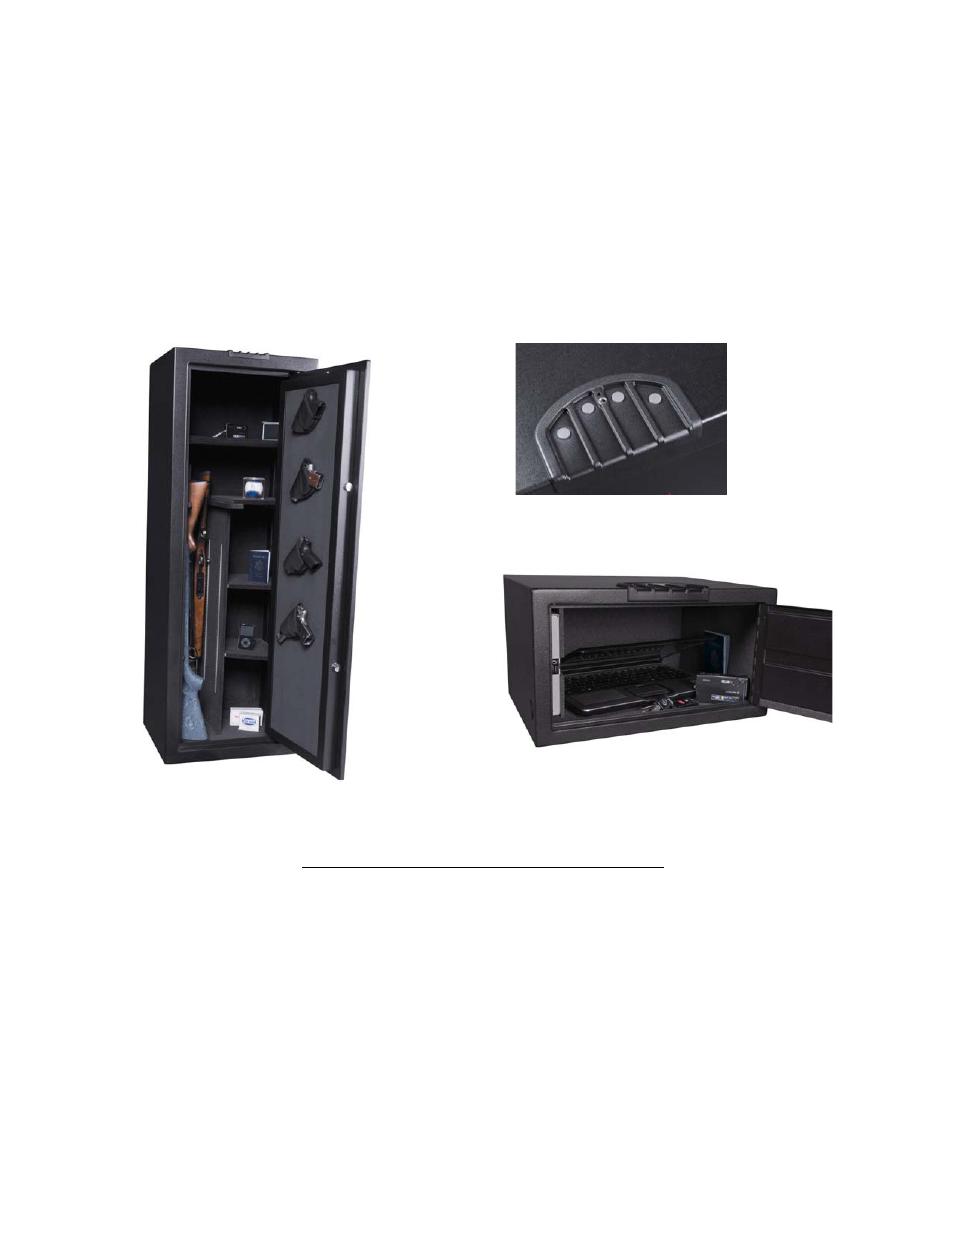 gunvault hv 5900 user manual page 4 15 also for hv 5500 hv 3000 rh manualsdir com